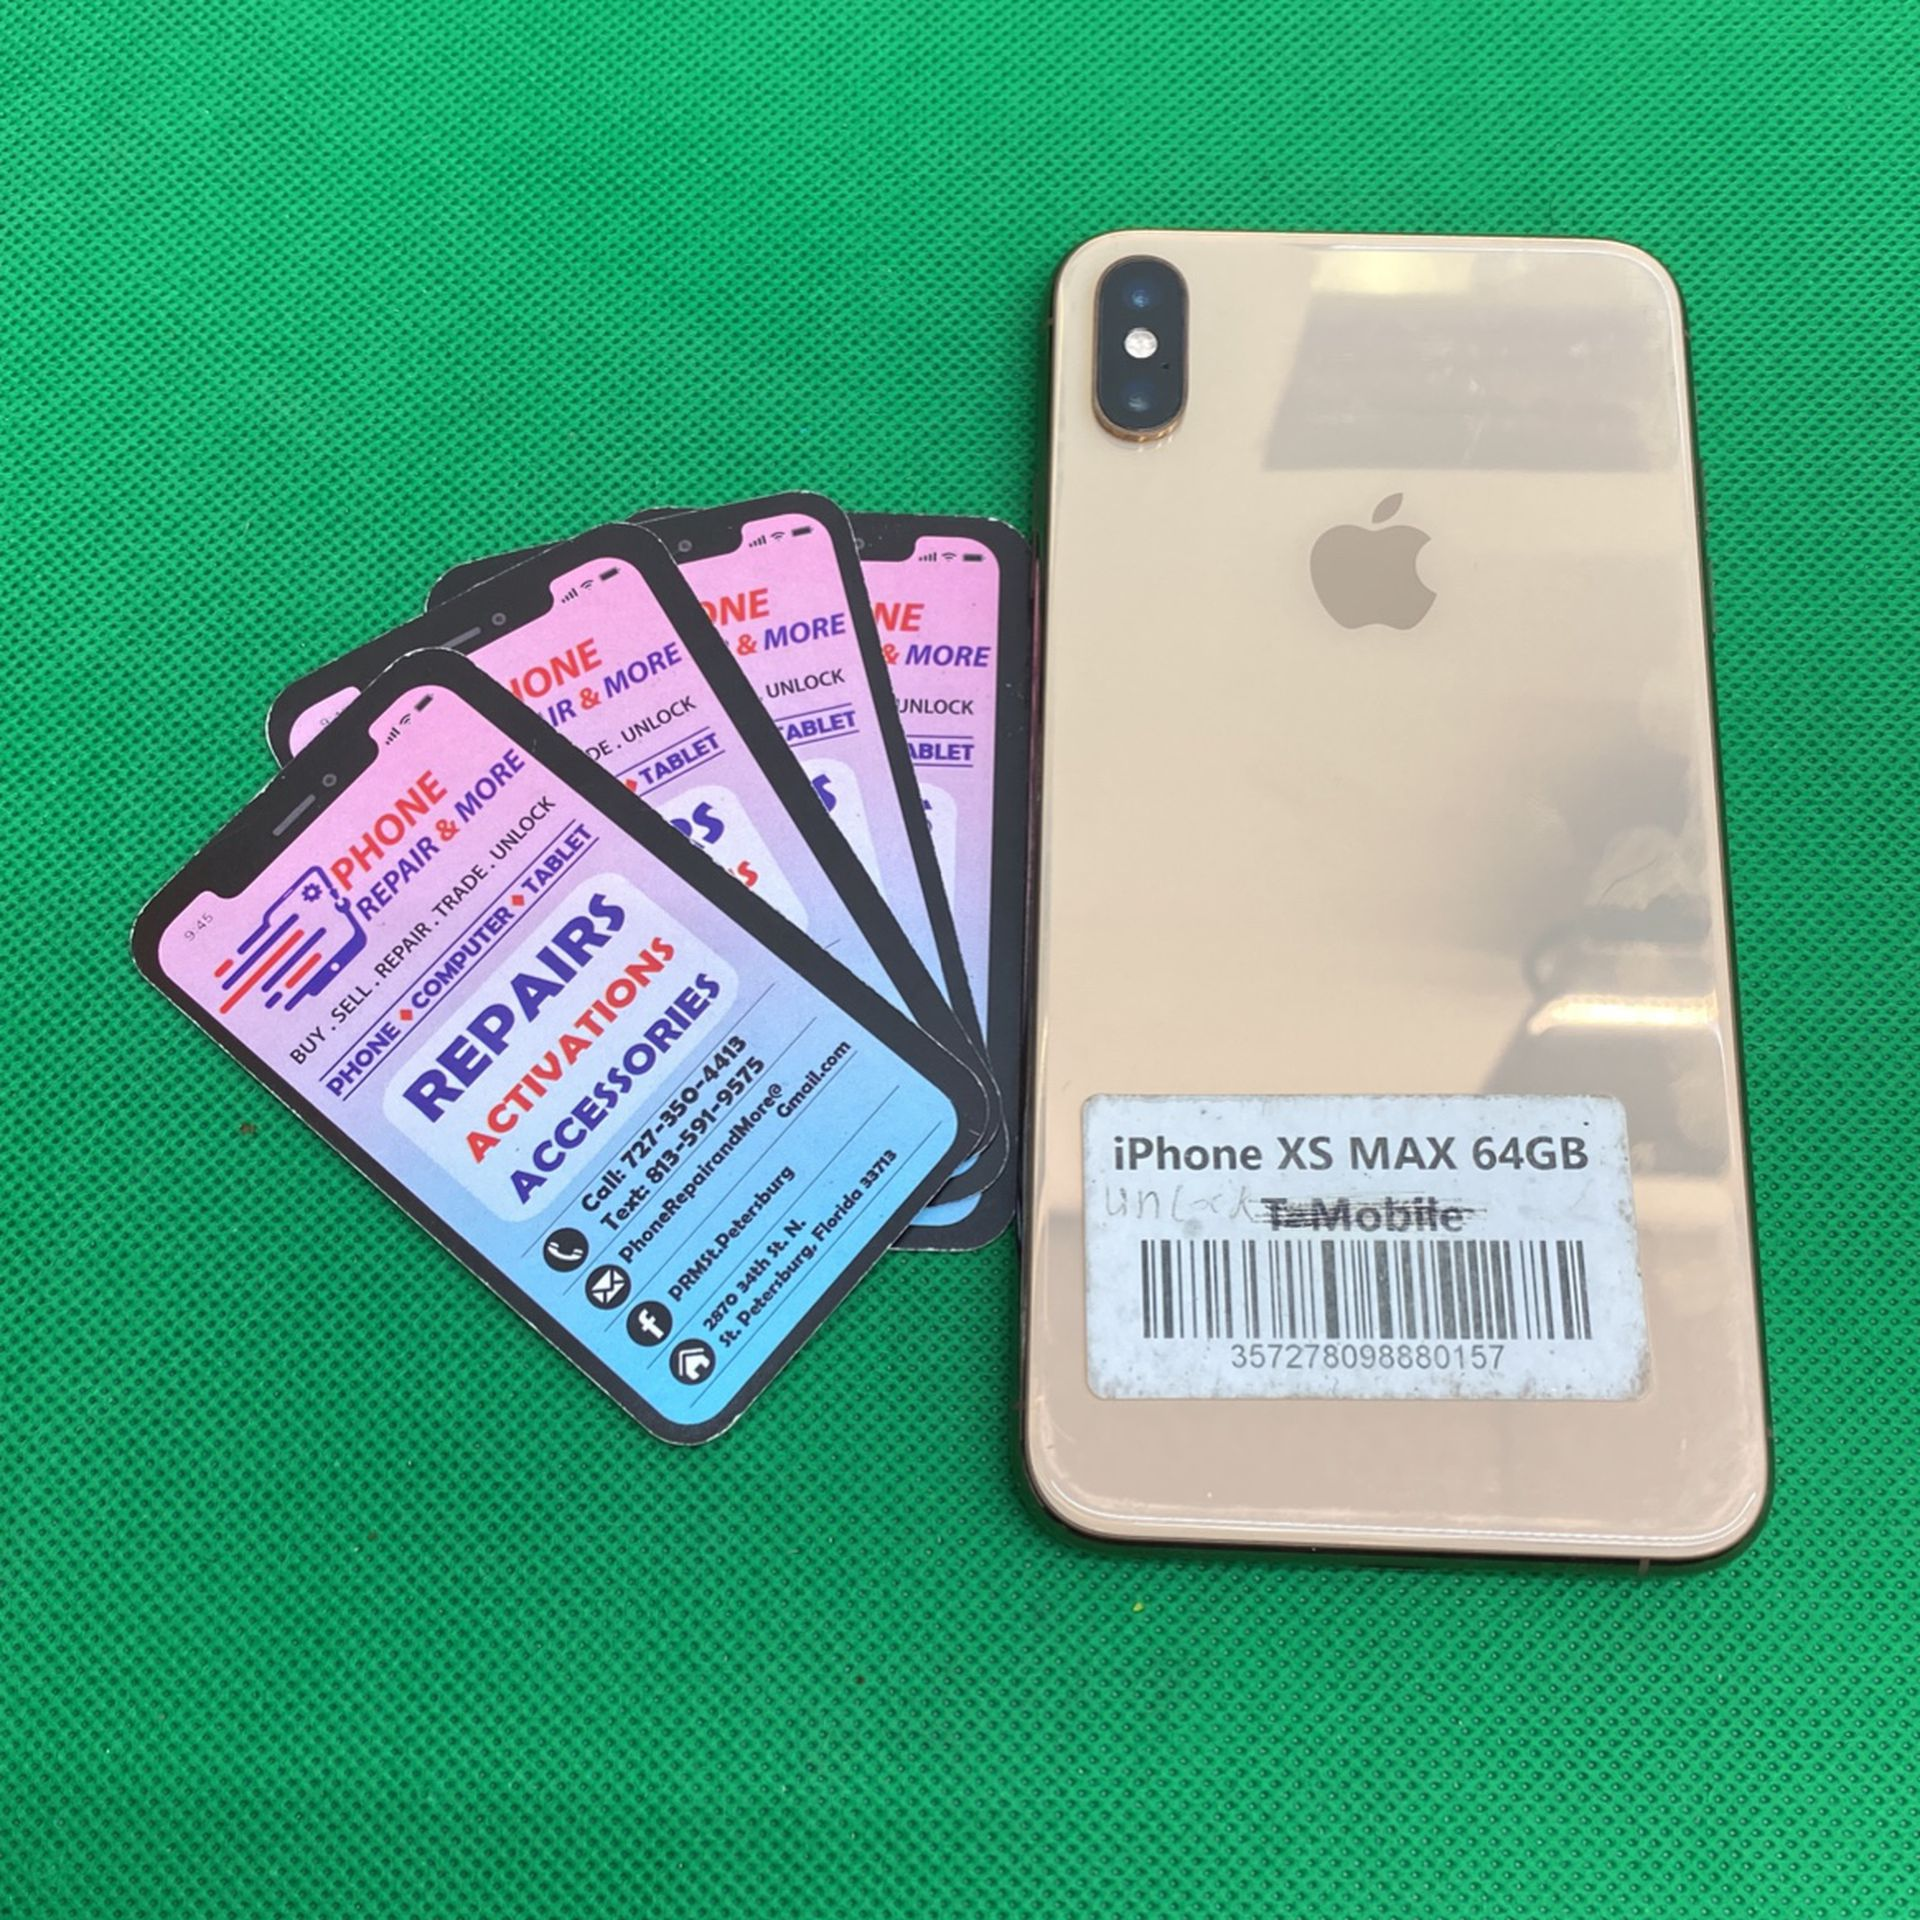 Iphone xs max (64GB,128GB, 256GB) Factory unlock 30 day warranty